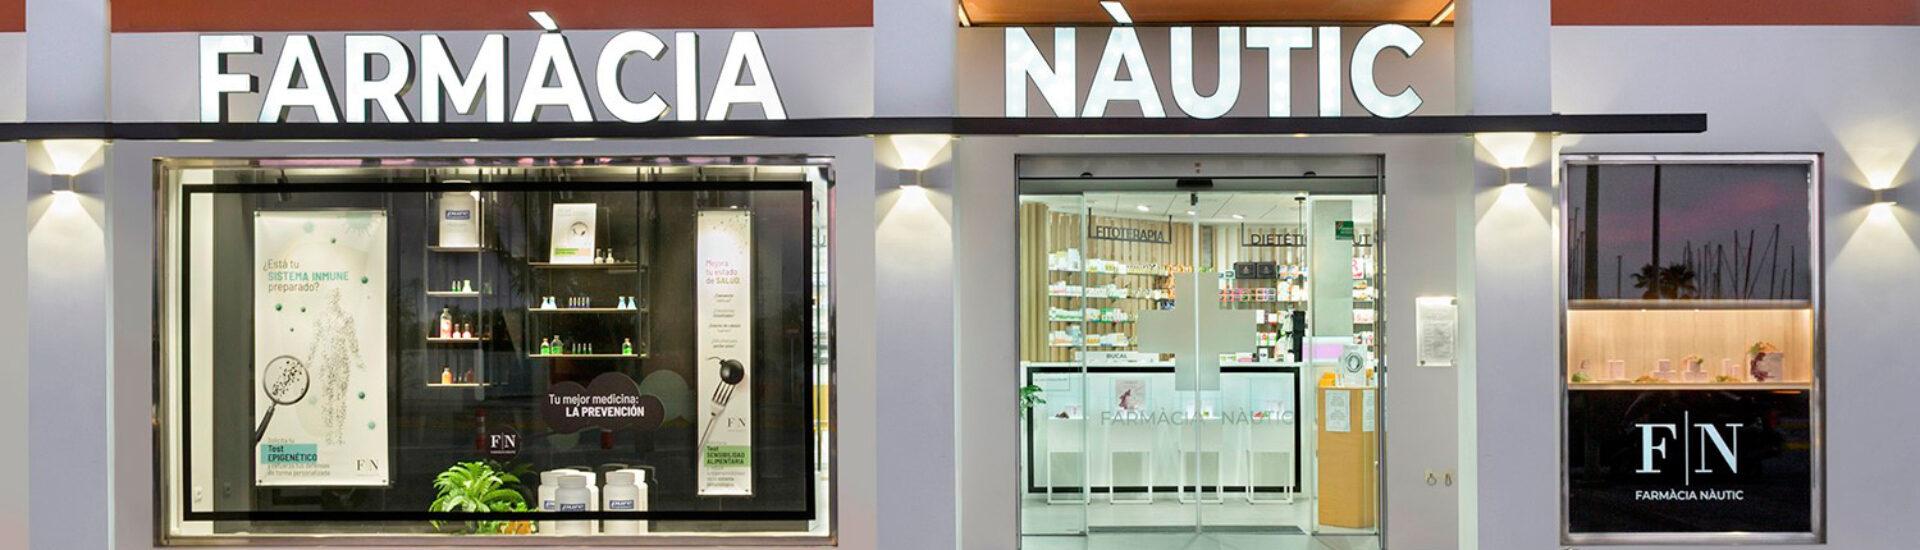 Fachada farmacia nautic